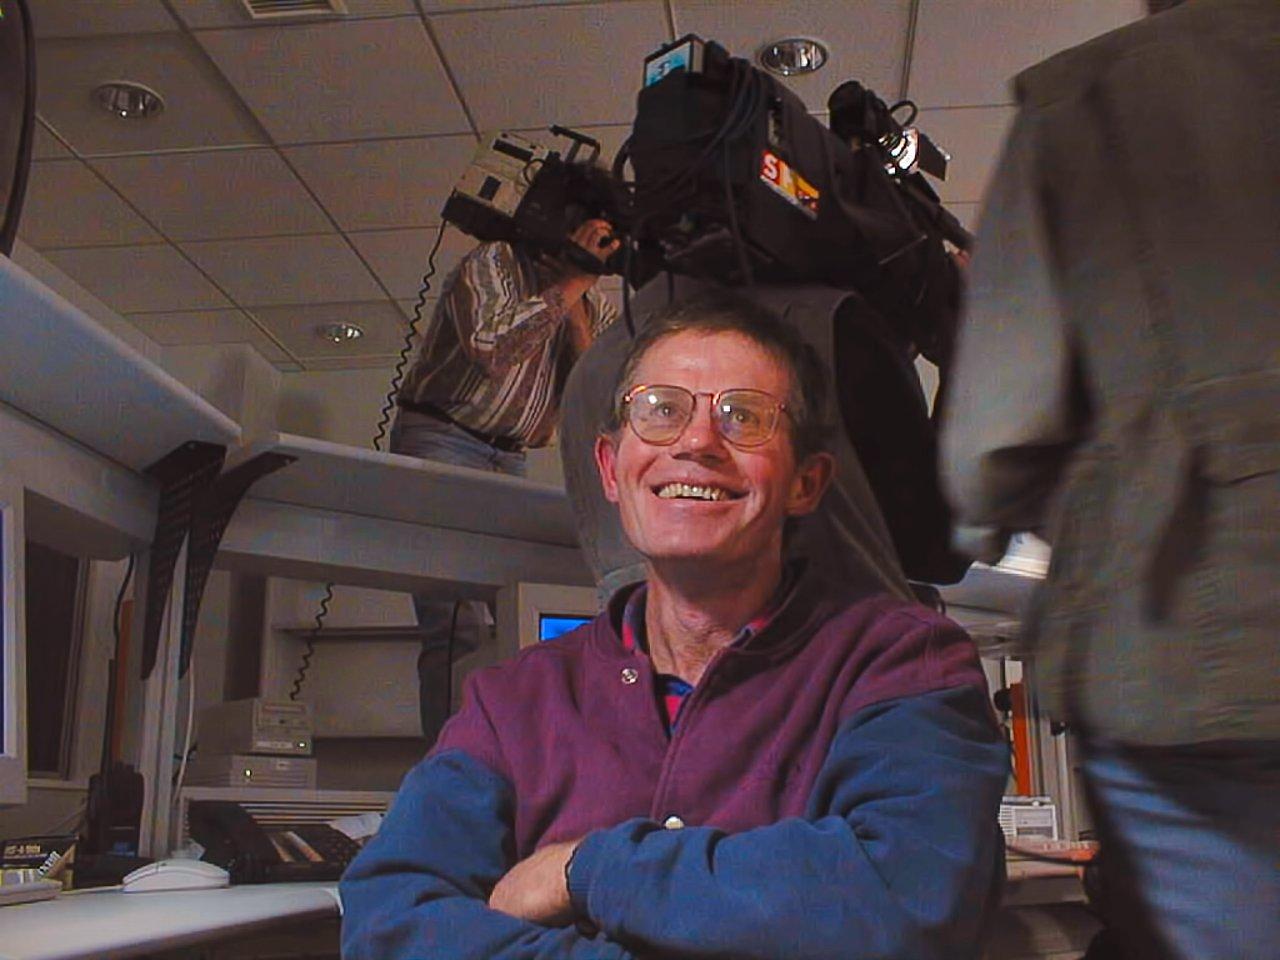 Peter Gray at UT1 first light